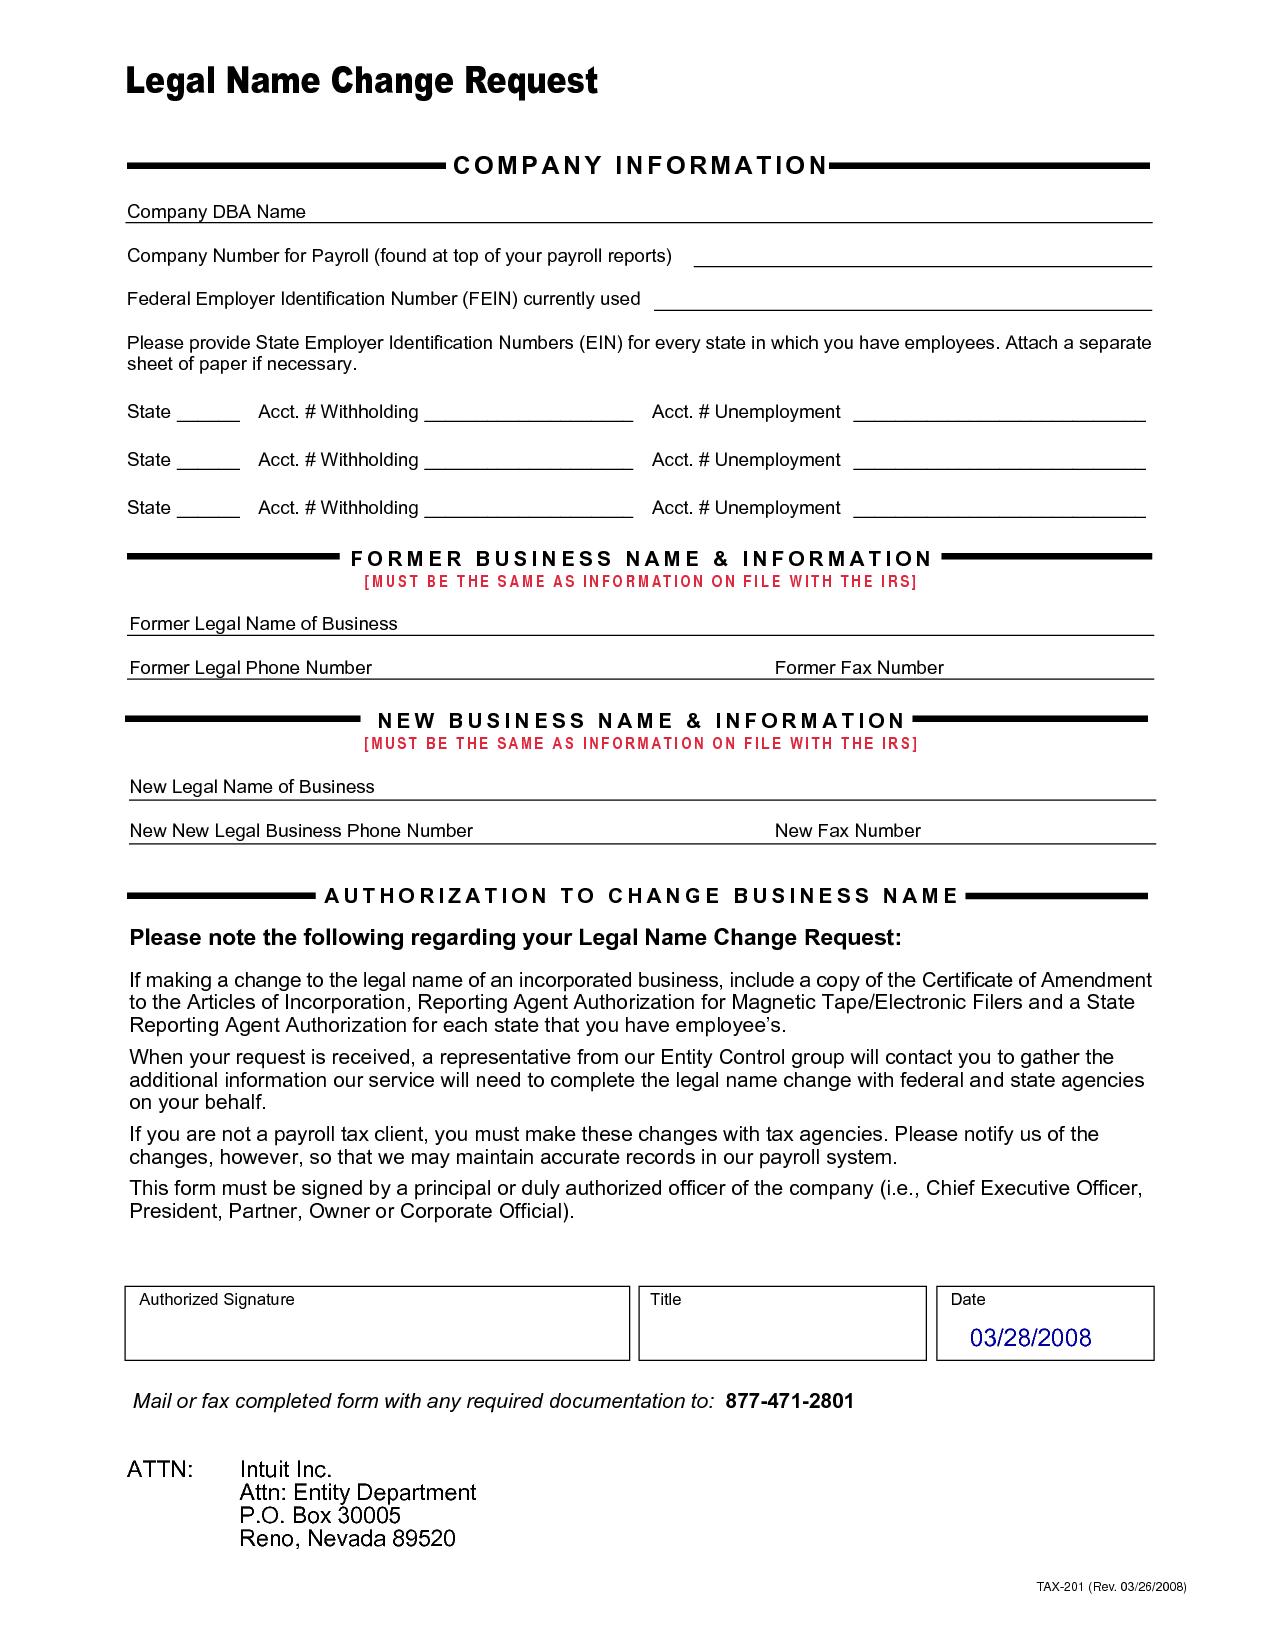 Company Forms Sample